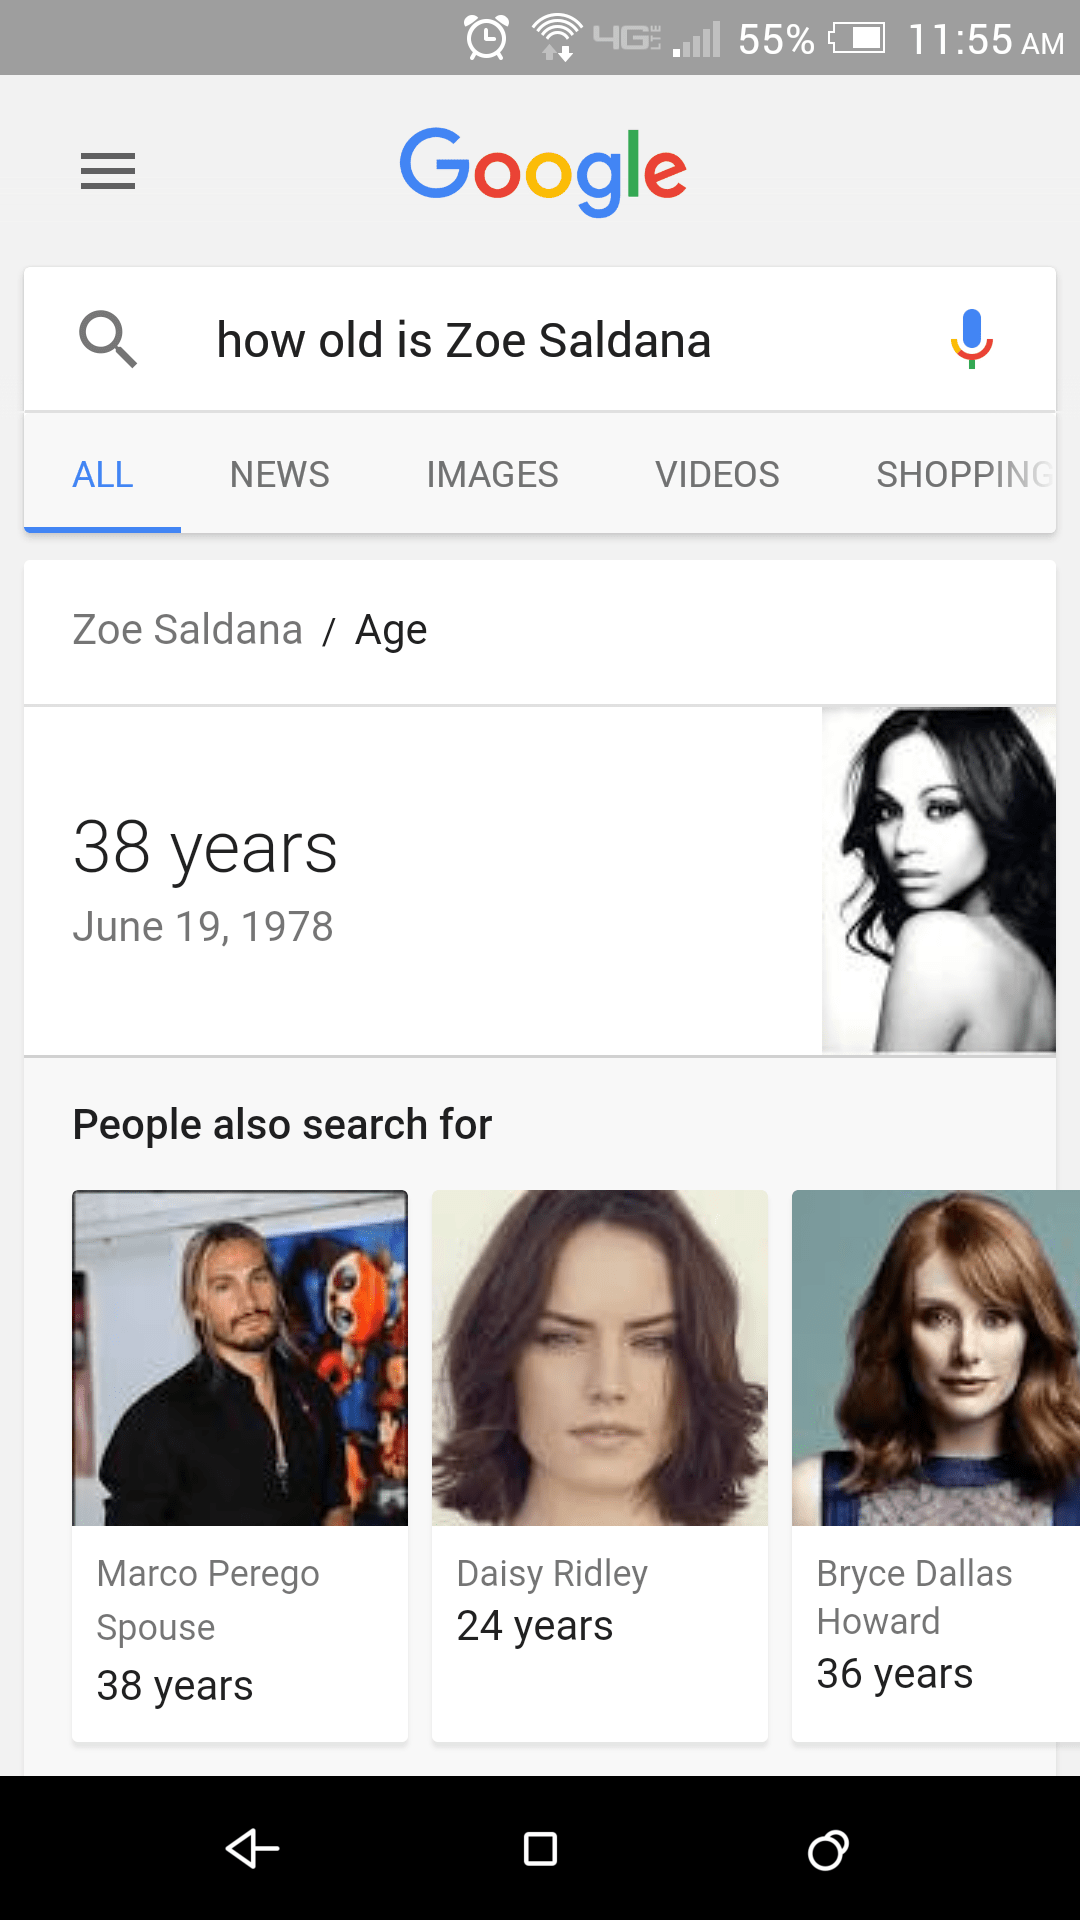 Google Voice Search Zoe Saldana age query